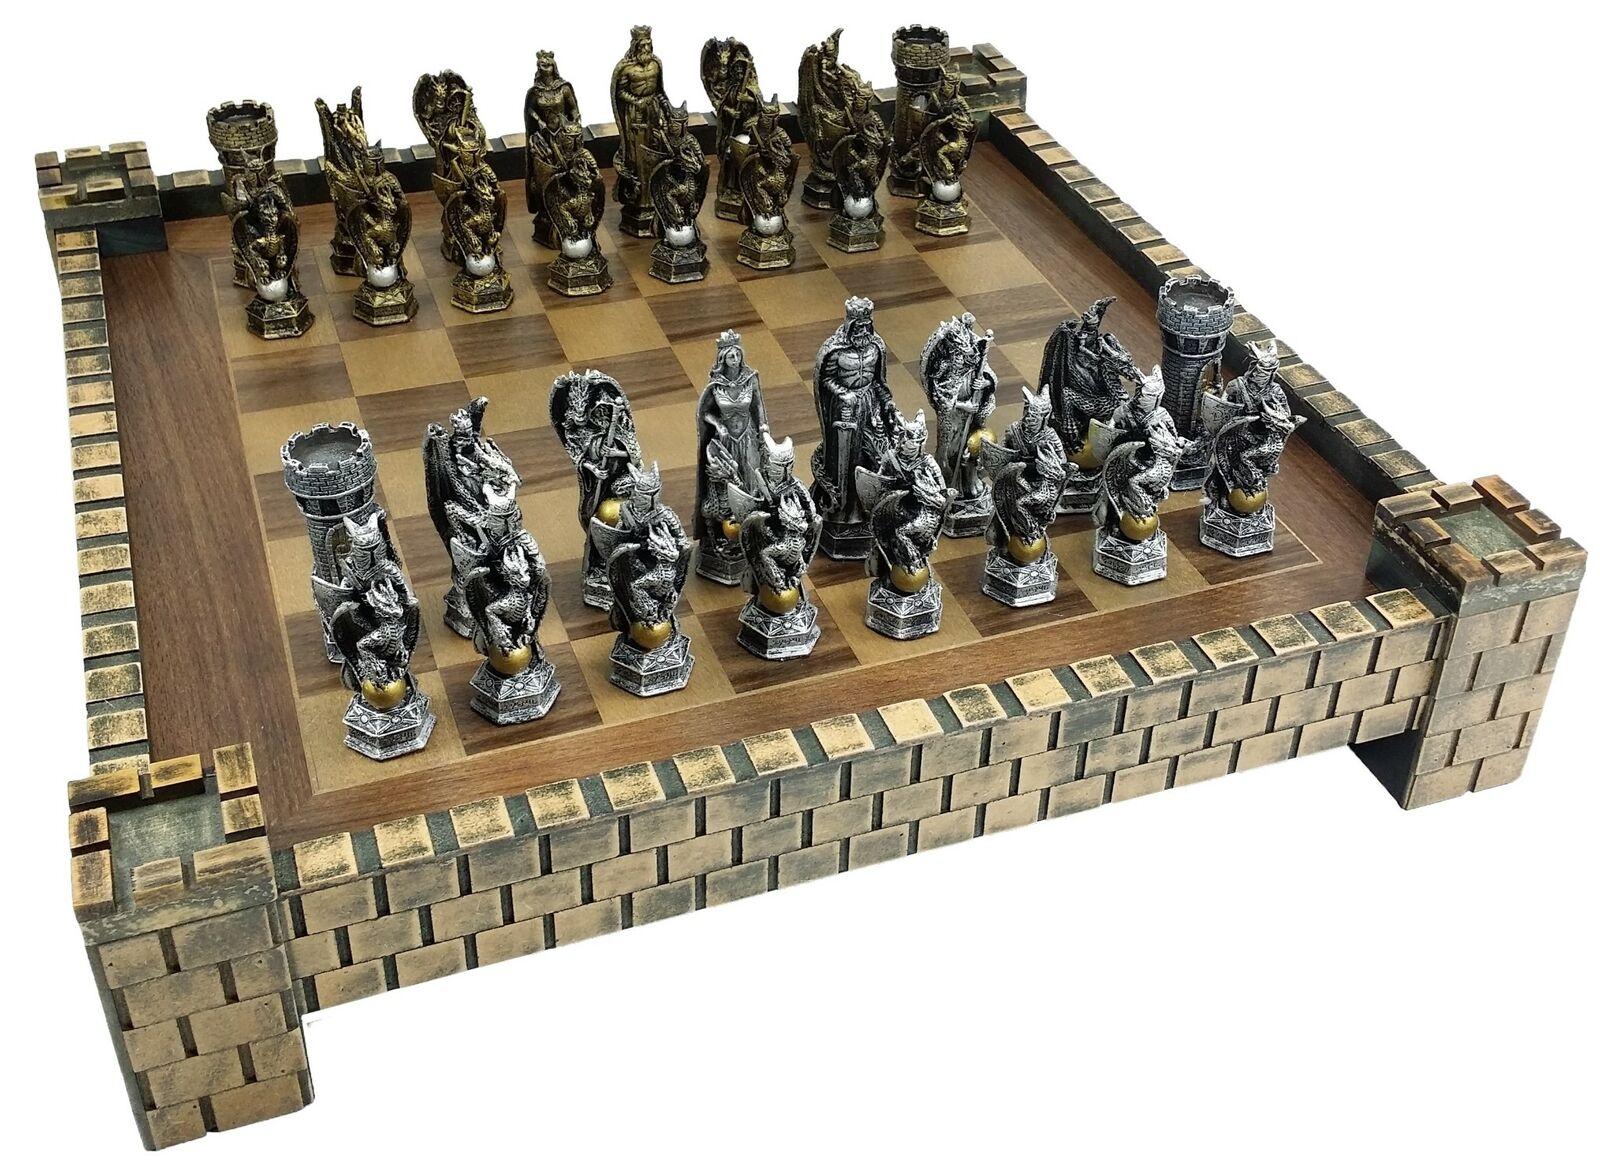 King Arthur Chevaliers avec Dragon Fantasy Medieval Times Chess Set Château Board 17